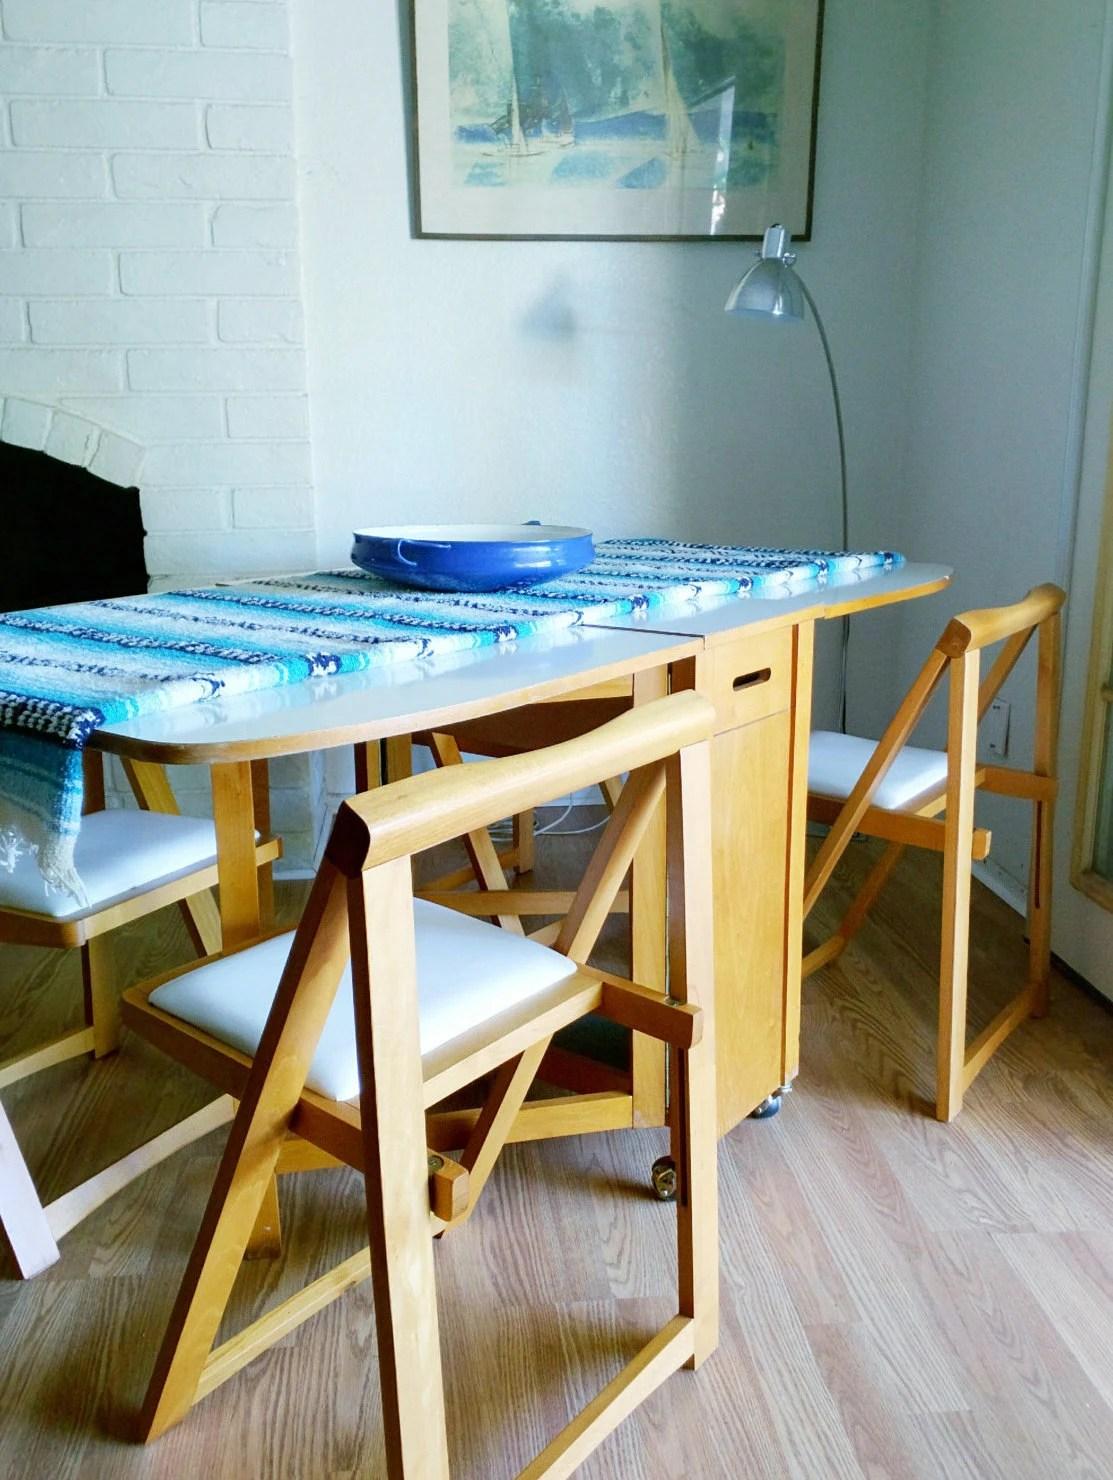 Vintage MCM Danish Drop Leaf Table Four Self Storing  : ilfullxfull767036951j8qt from hautejuice.wordpress.com size 1113 x 1480 jpeg 285kB